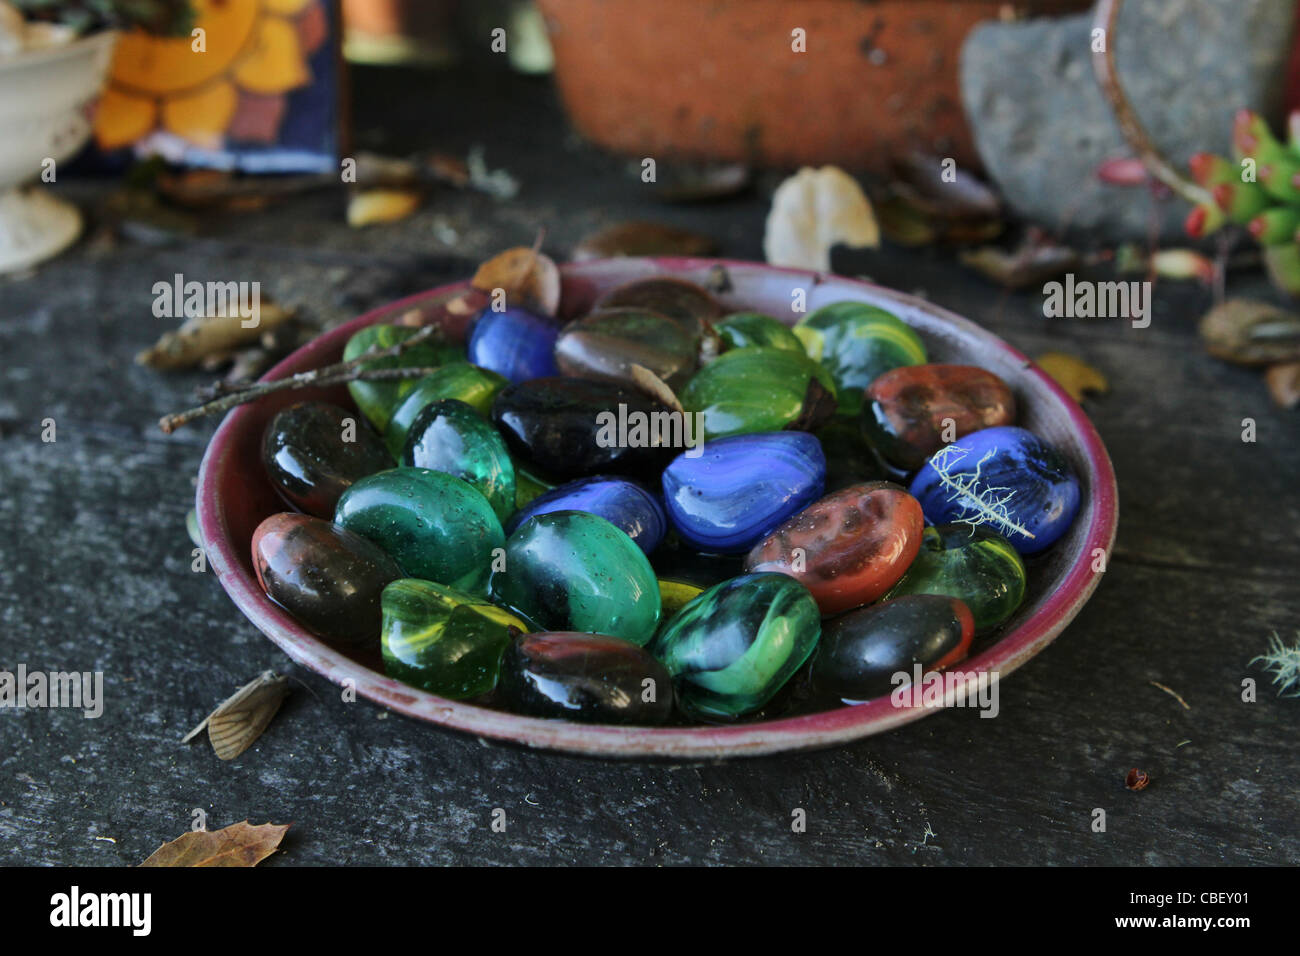 A bowl of colorful polished rocks. - Stock Image